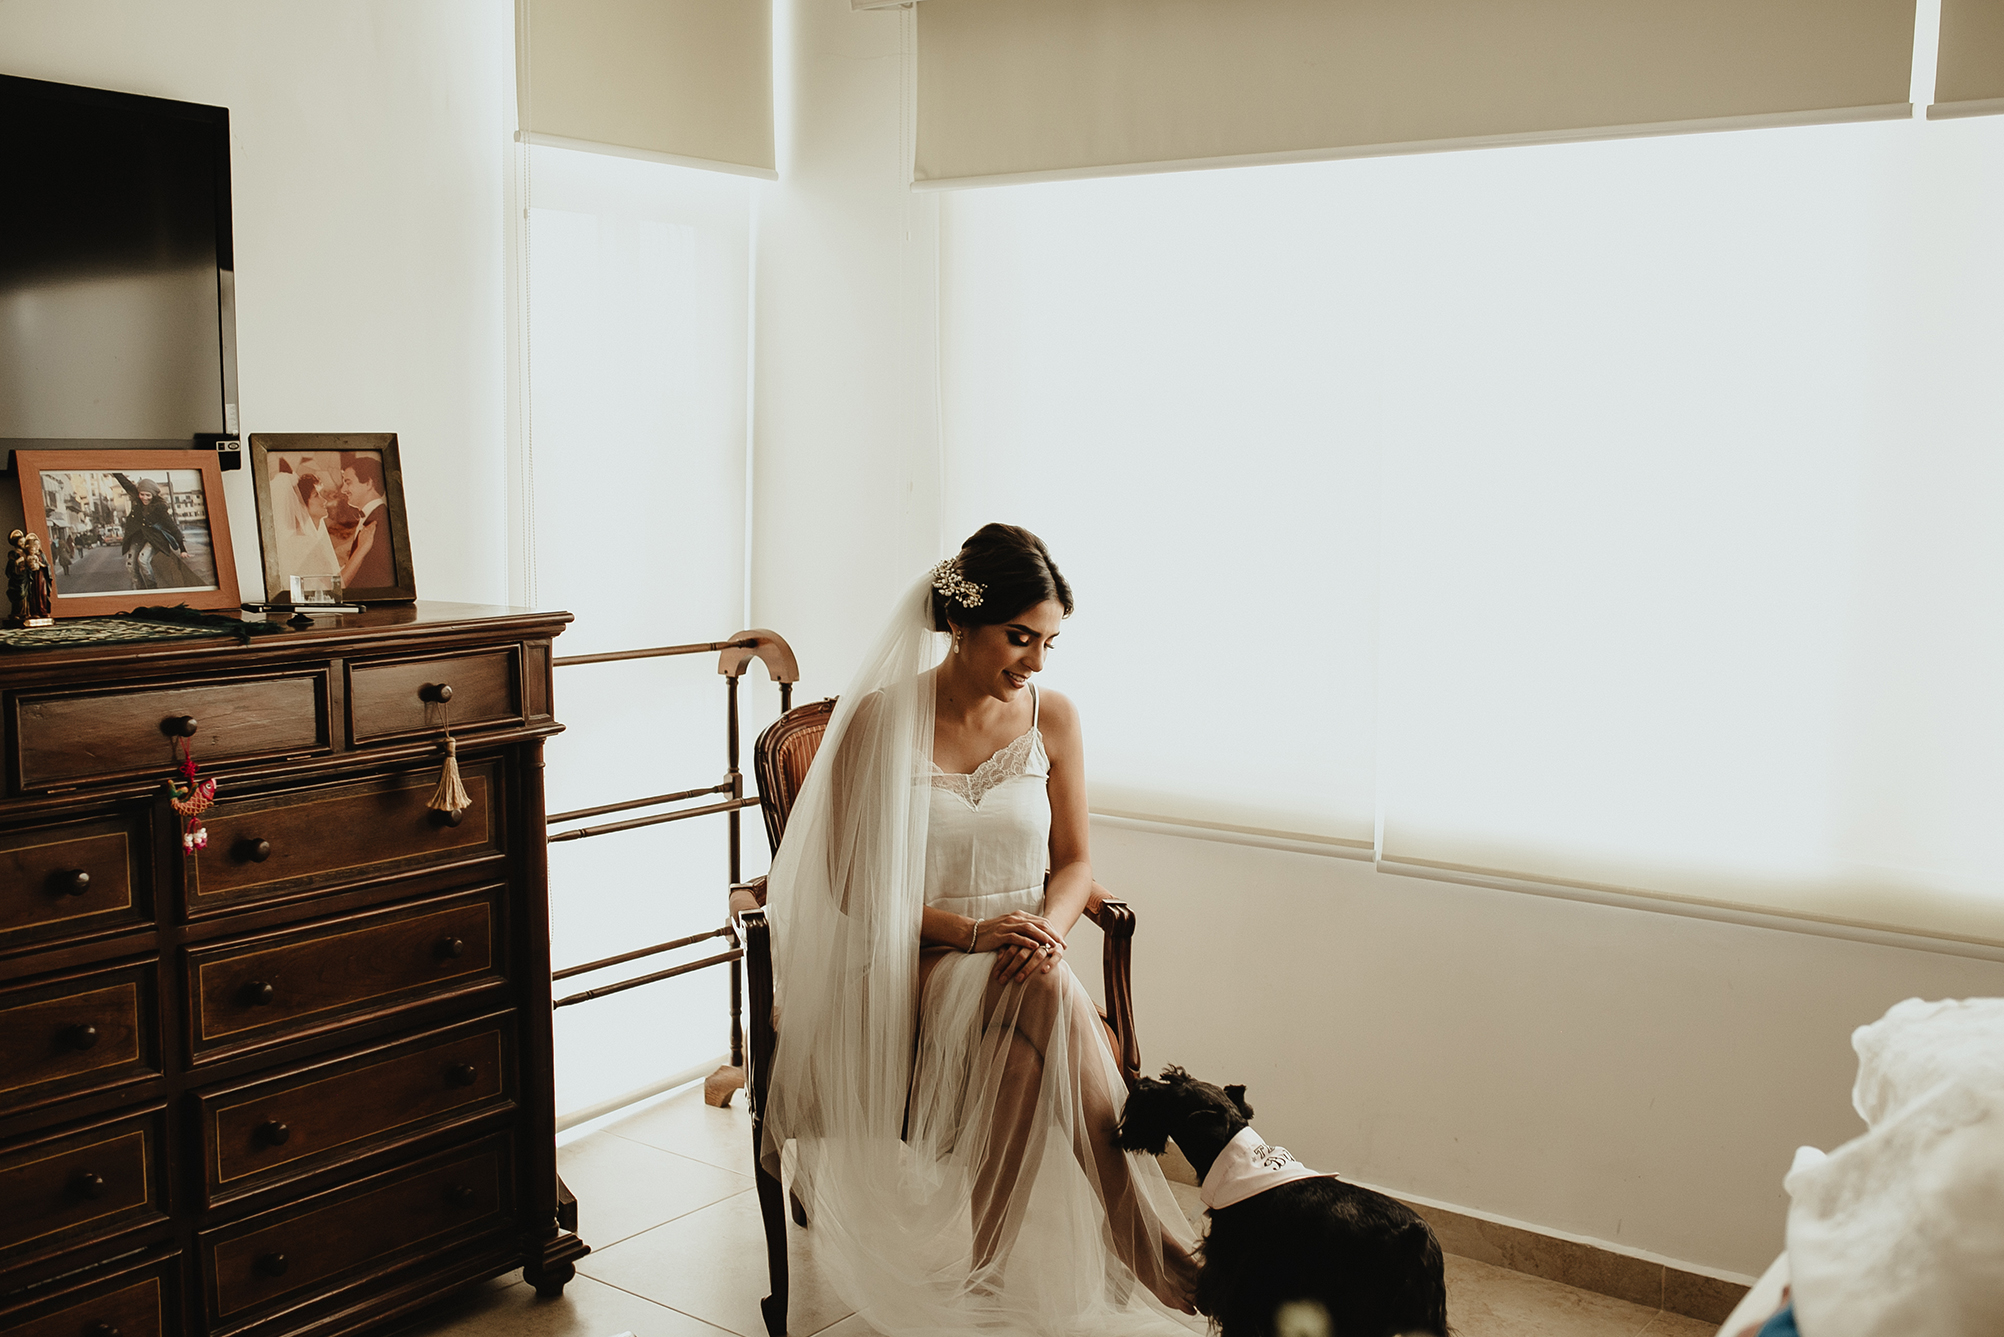 0079F&Yslide_WeddingDstination_MeridaYucatan_HaciendasMerida_BodasMexico_BodasYucatan_Boda_Destino.jpg